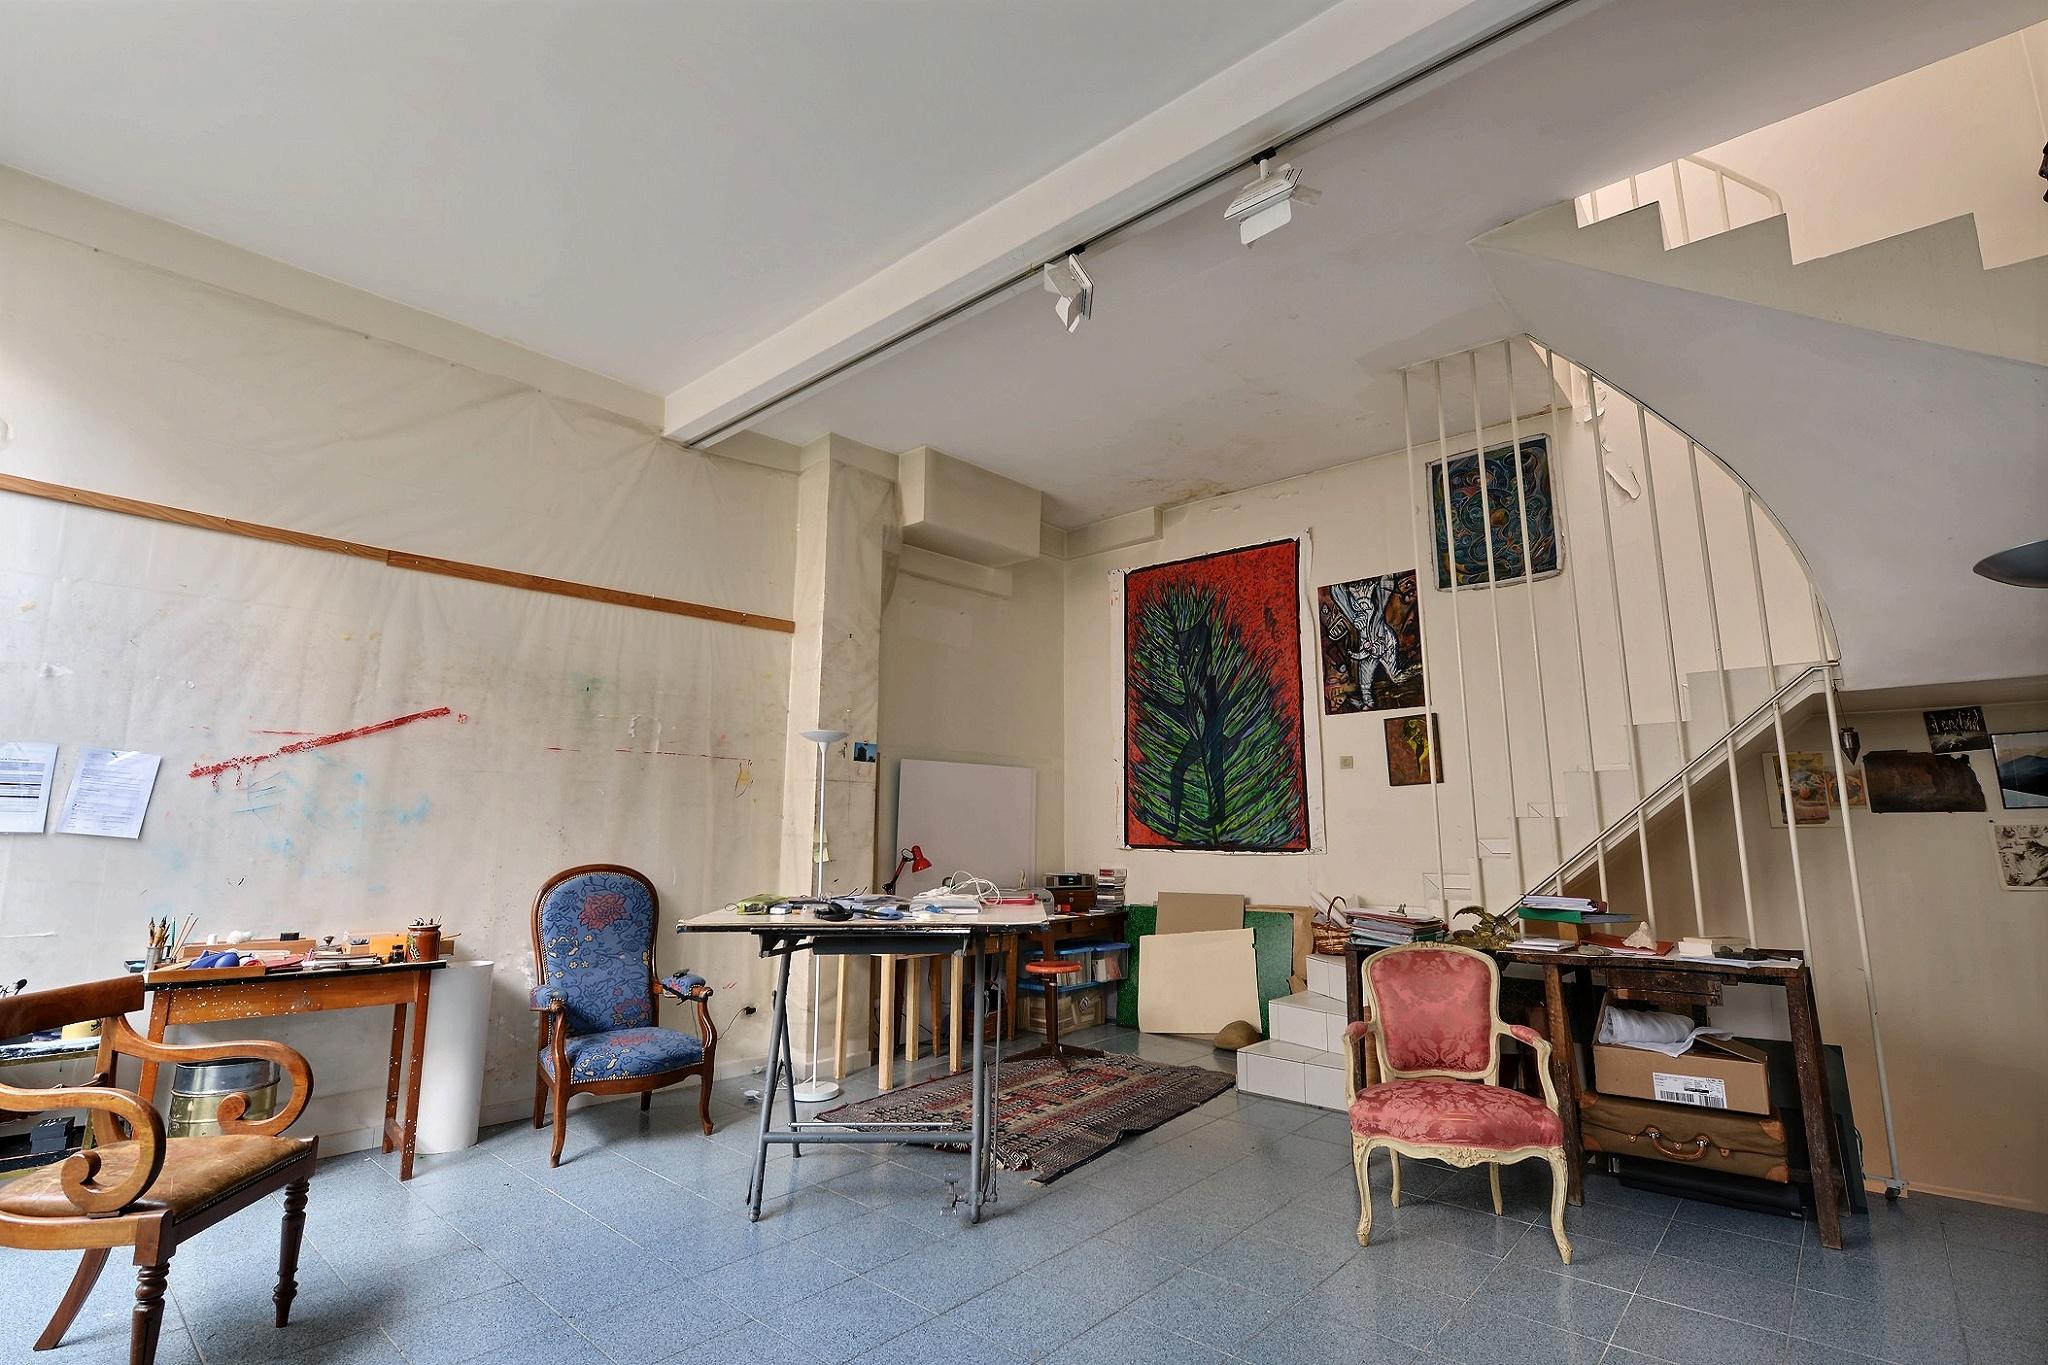 Atelier d'artiste, Mouzaïa Paris